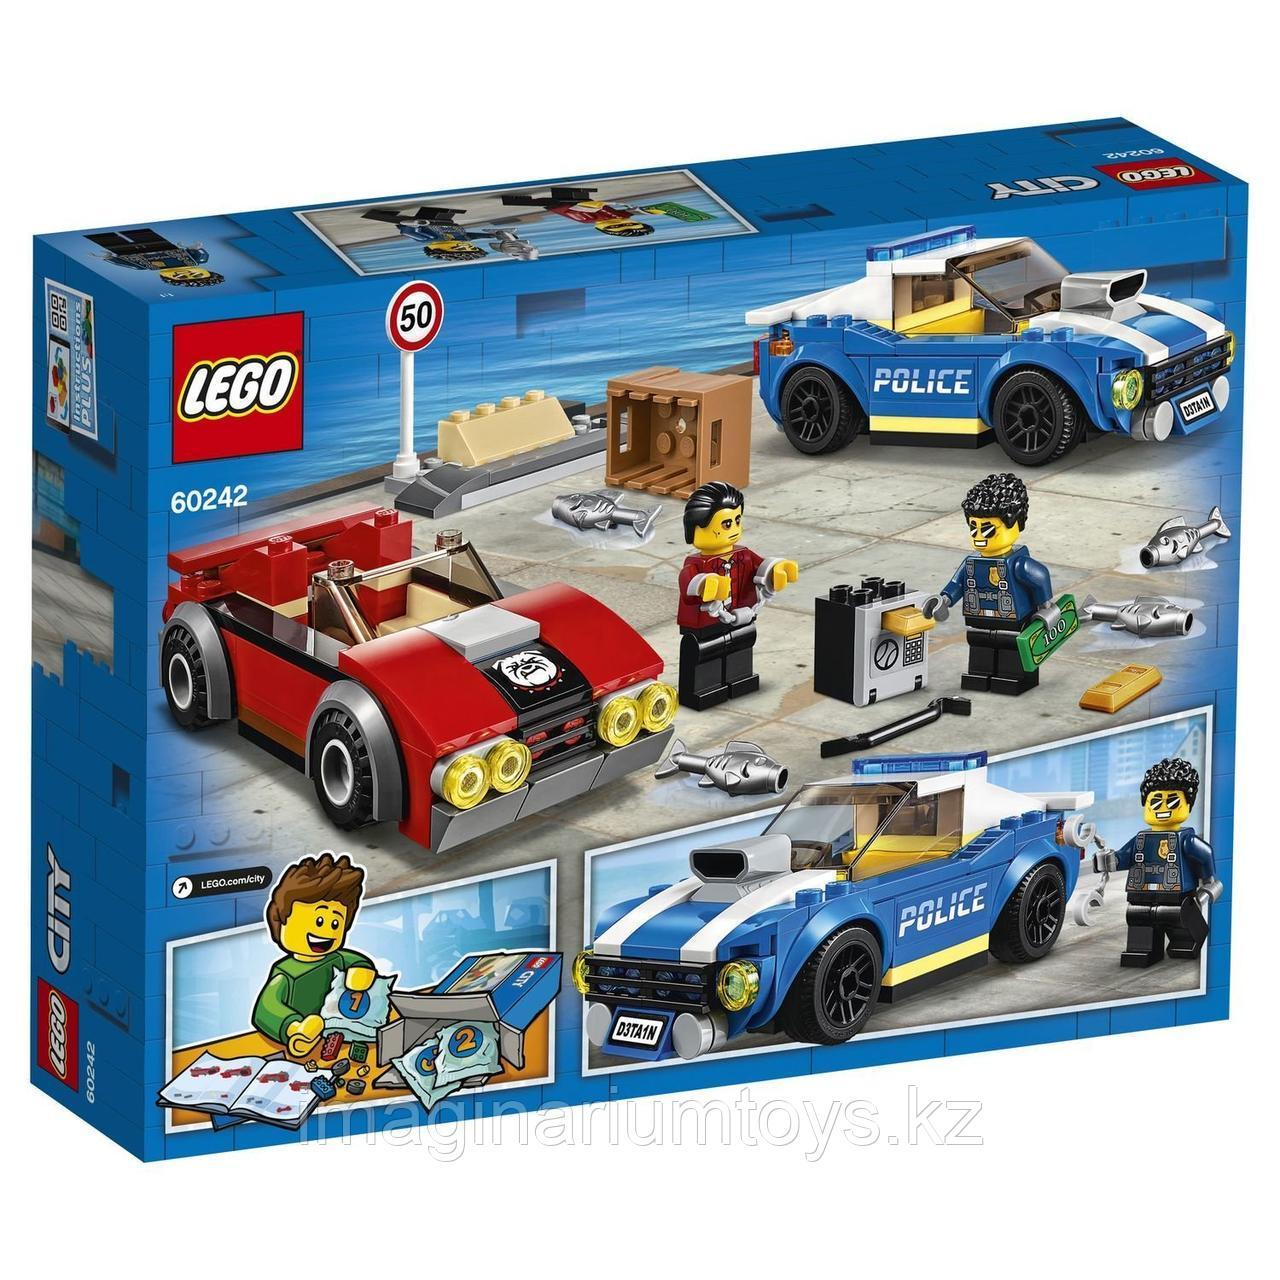 Конструктор LEGO City Лего Город Арест на шоссе 60242 - фото 6